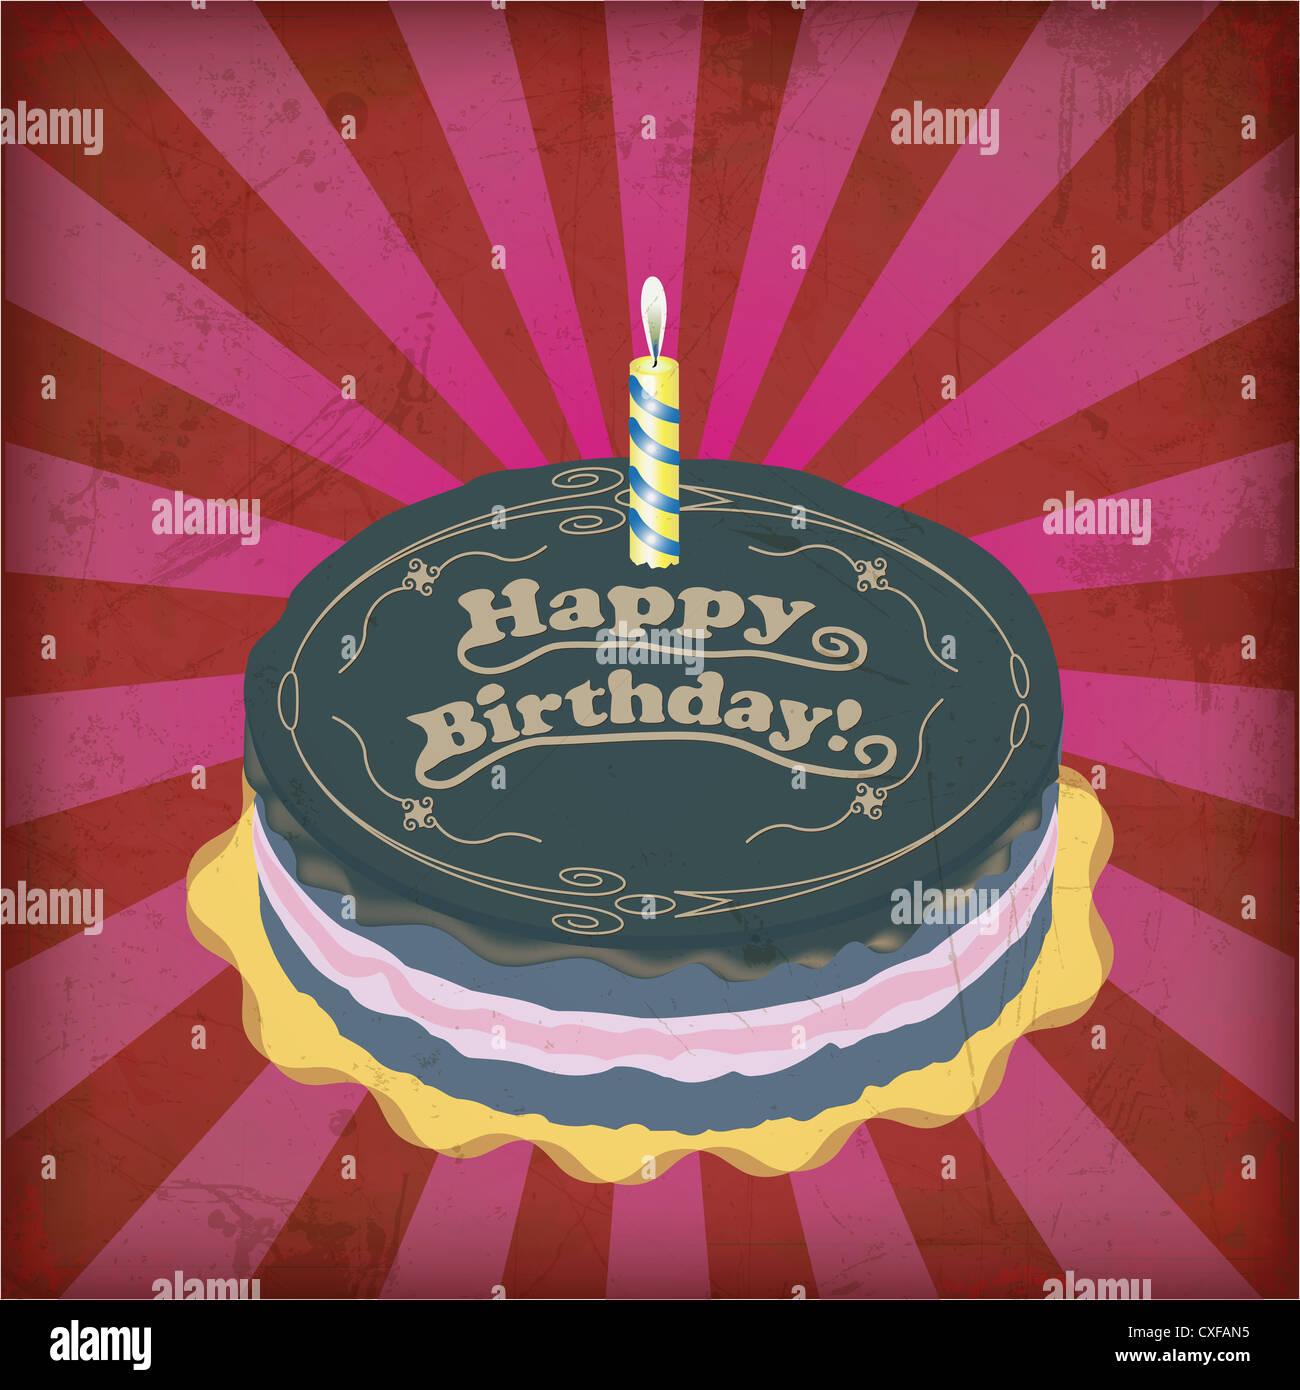 Swell Vintage Birthday Cake With Grunge Effect Stock Photo 50739505 Alamy Funny Birthday Cards Online Fluifree Goldxyz